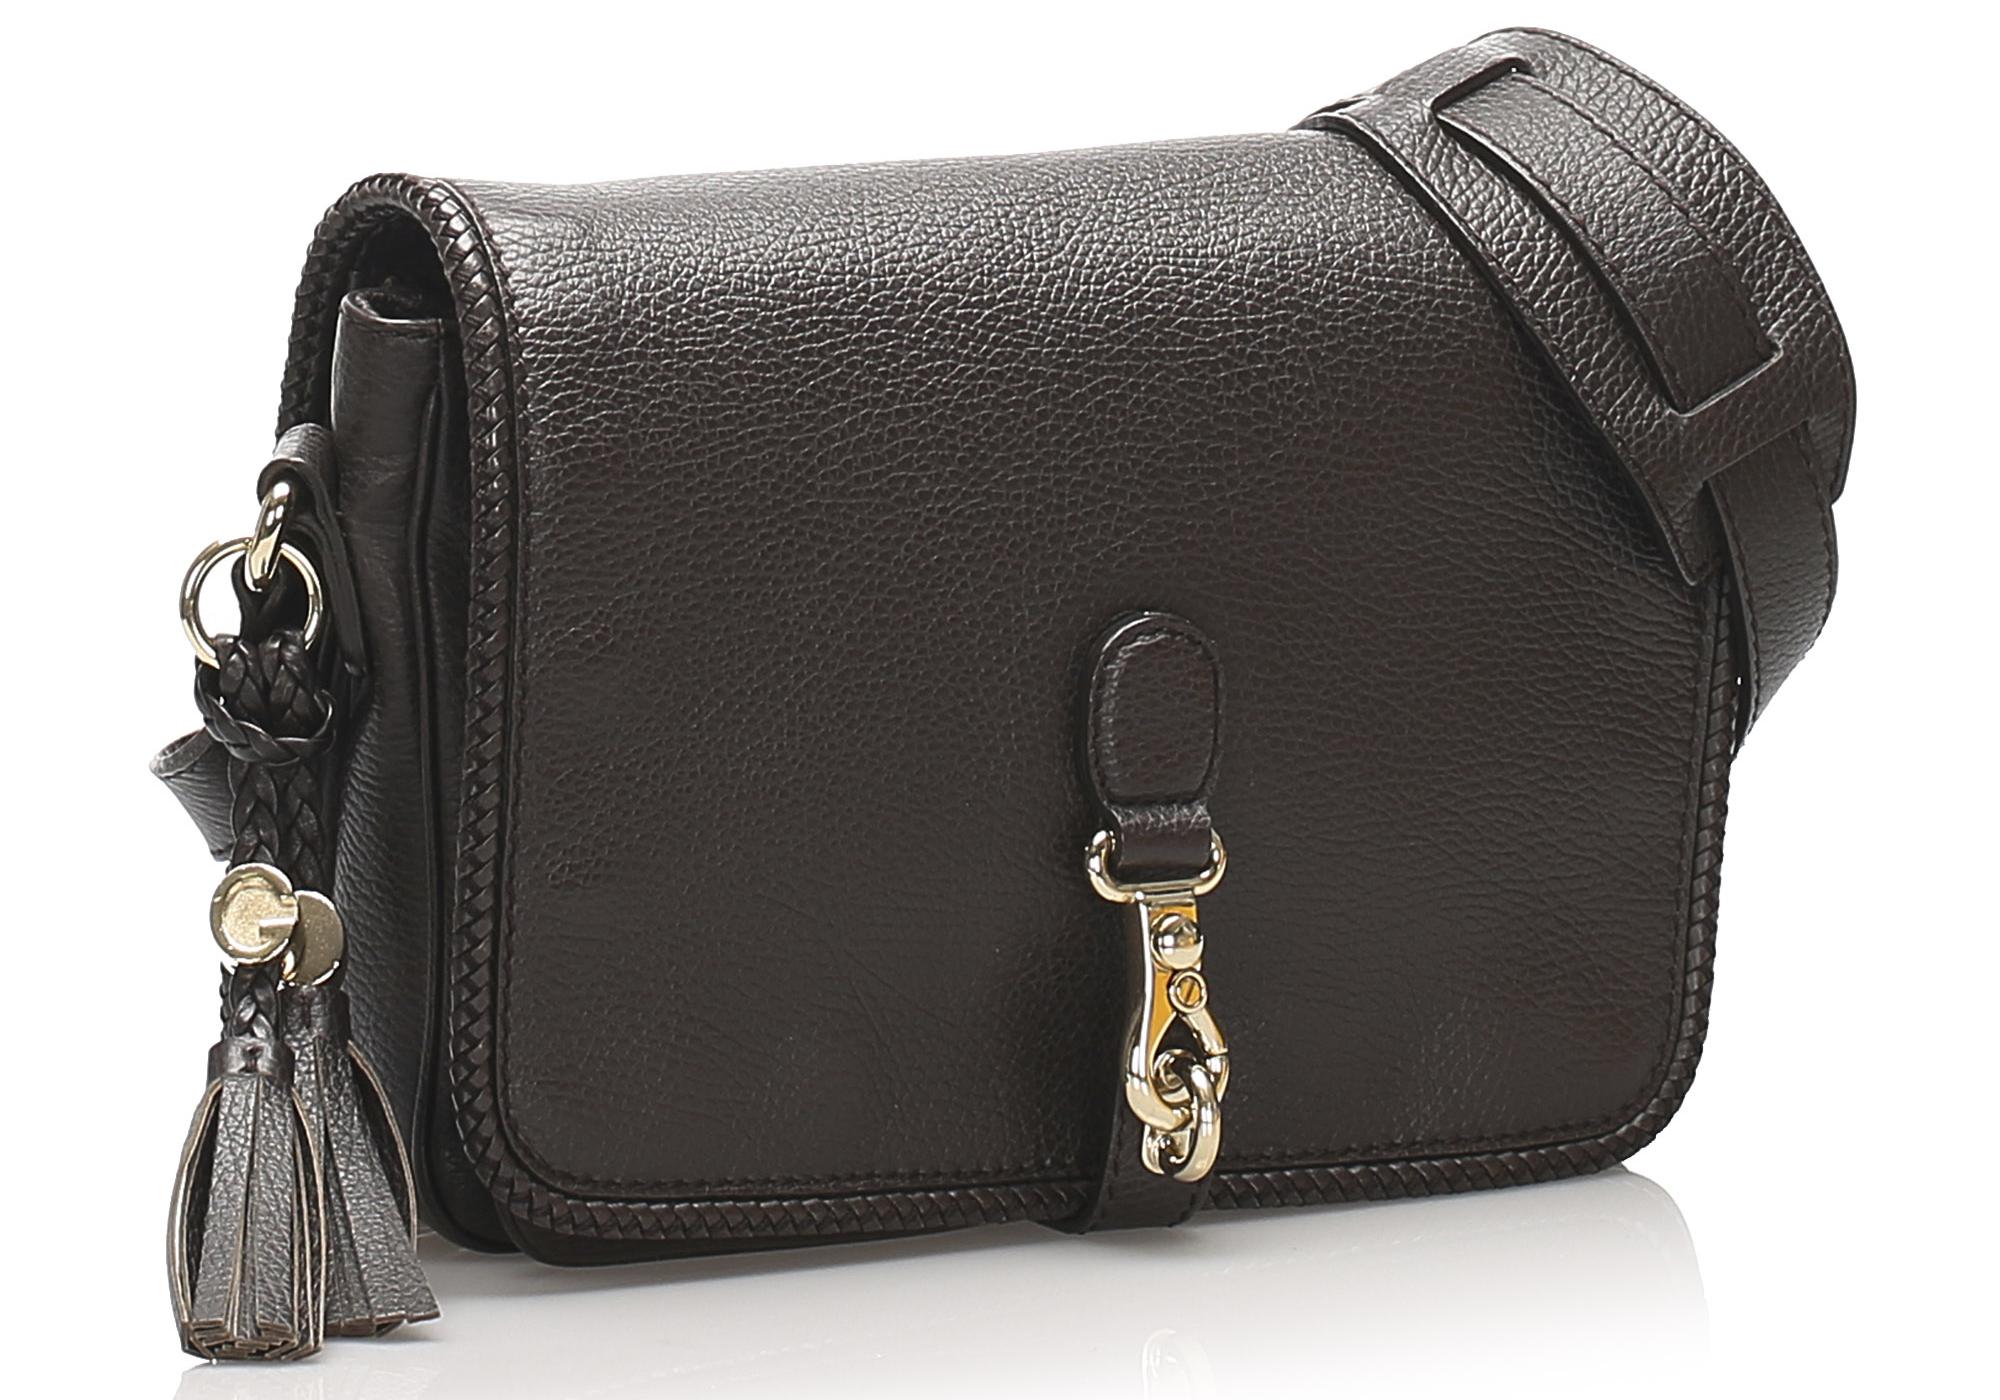 Gucci Marrakech Leather Crossbody Bag